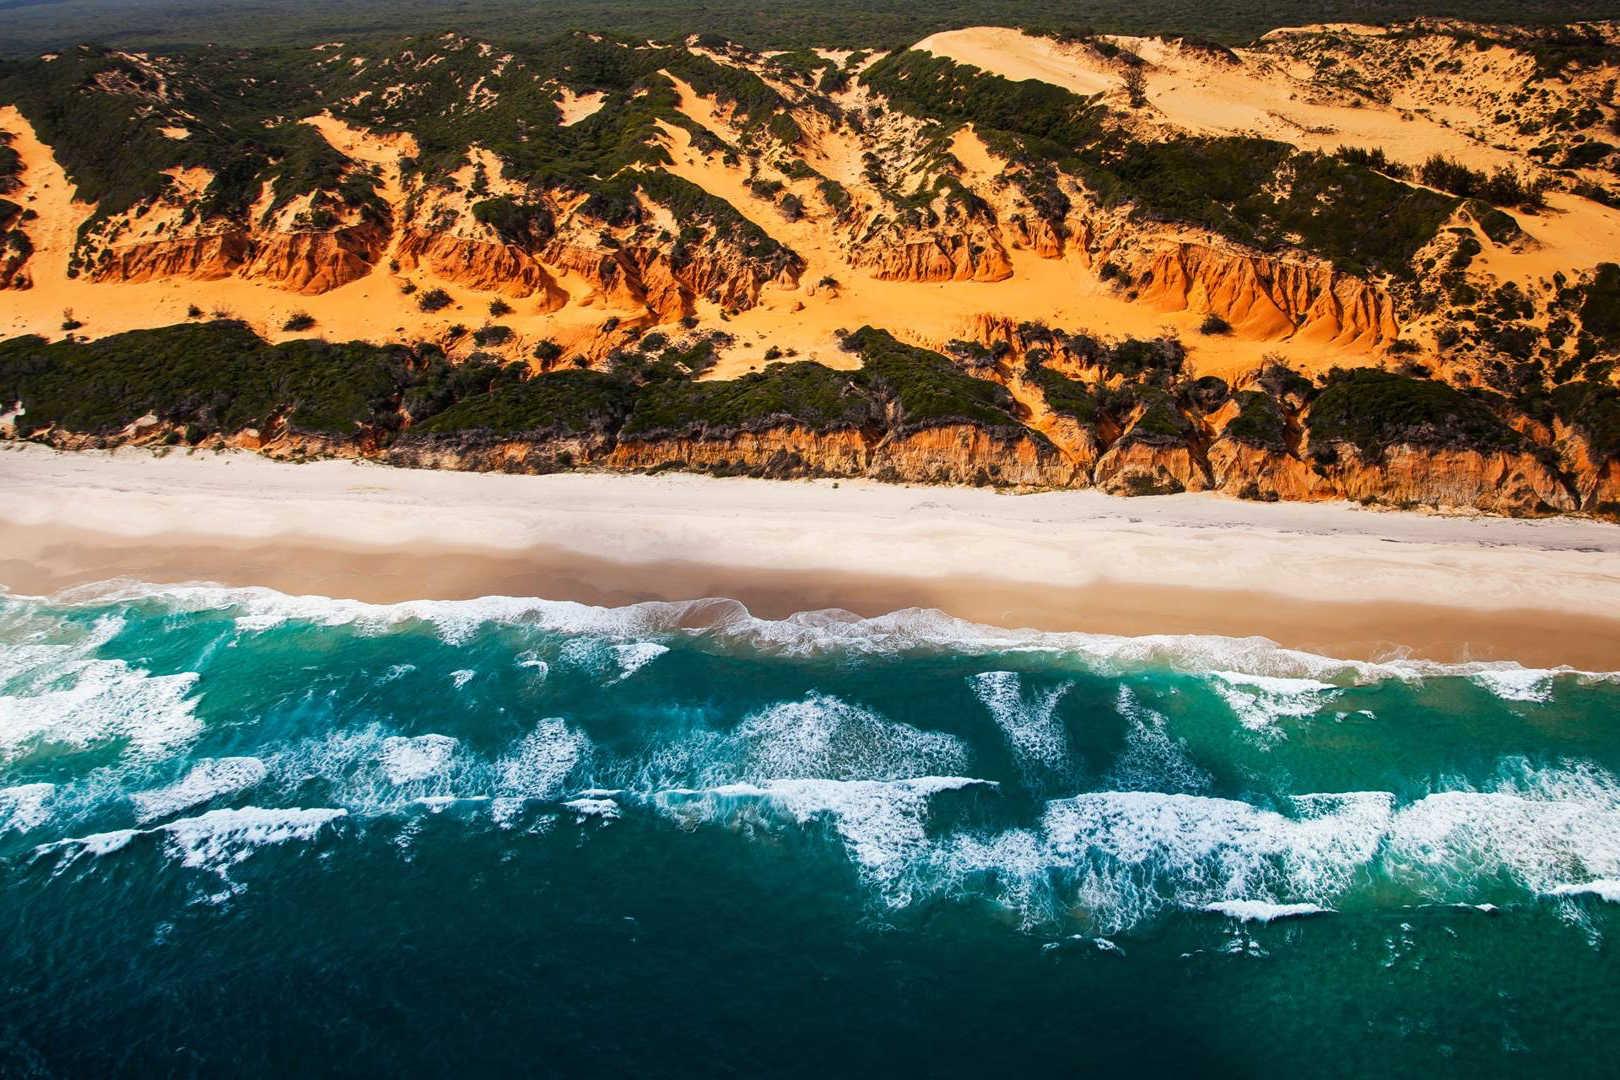 mozambique destinos viajar julio